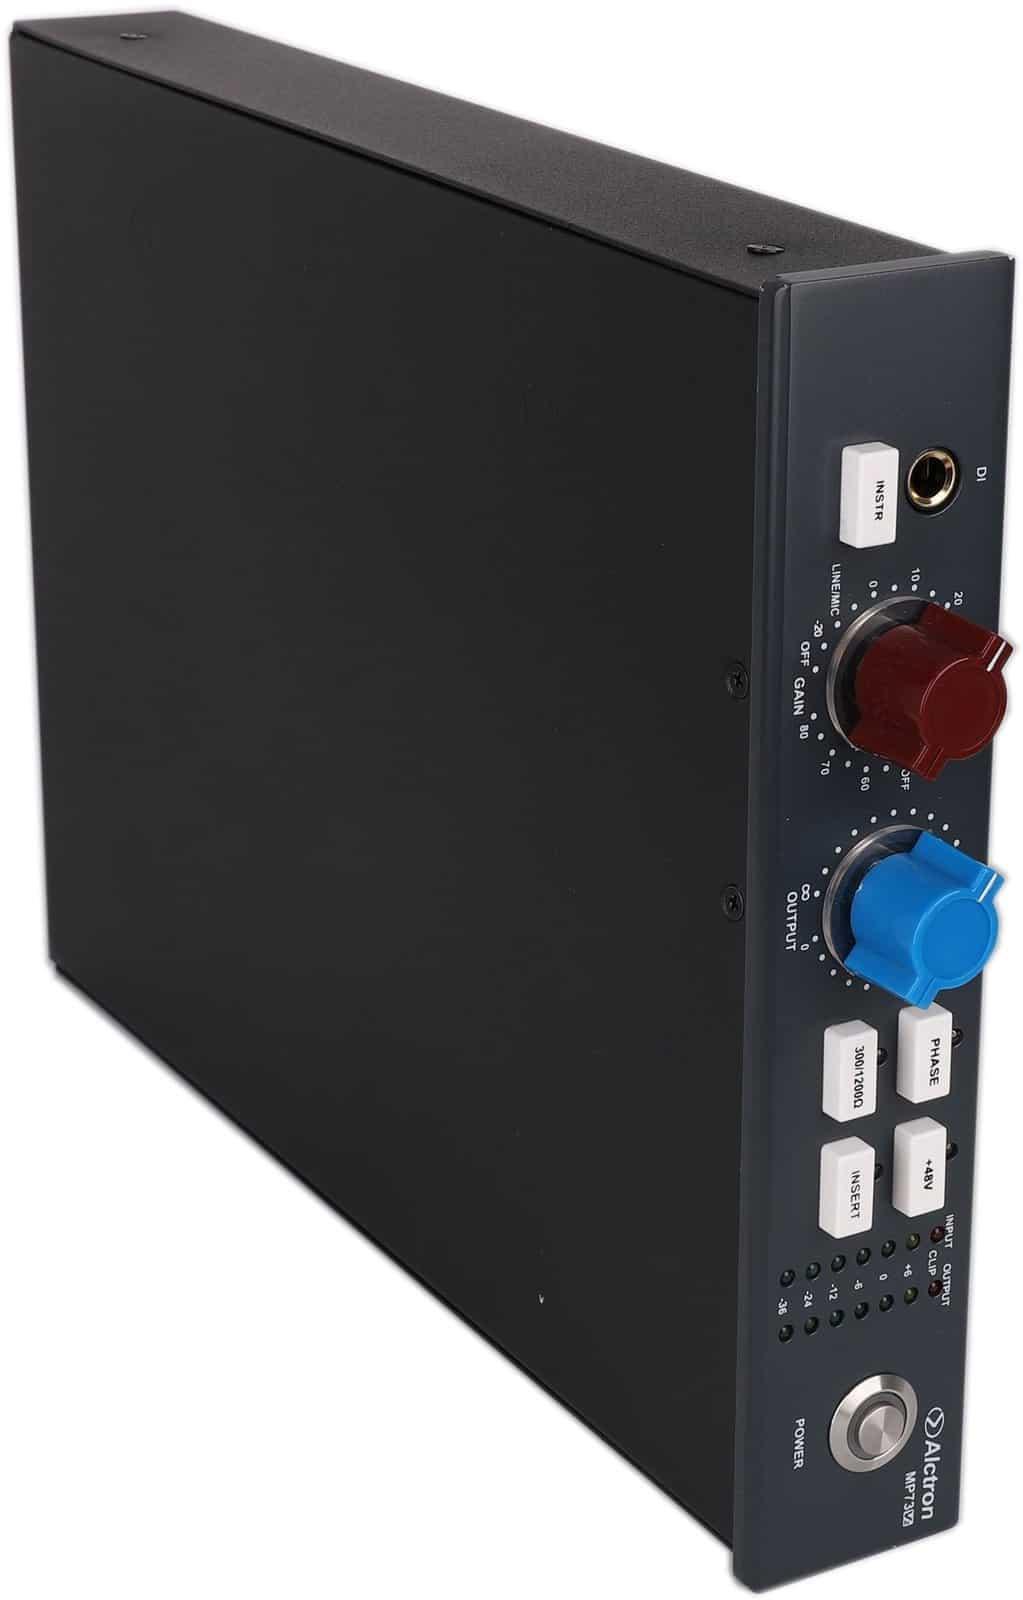 Alctron MP73 V2